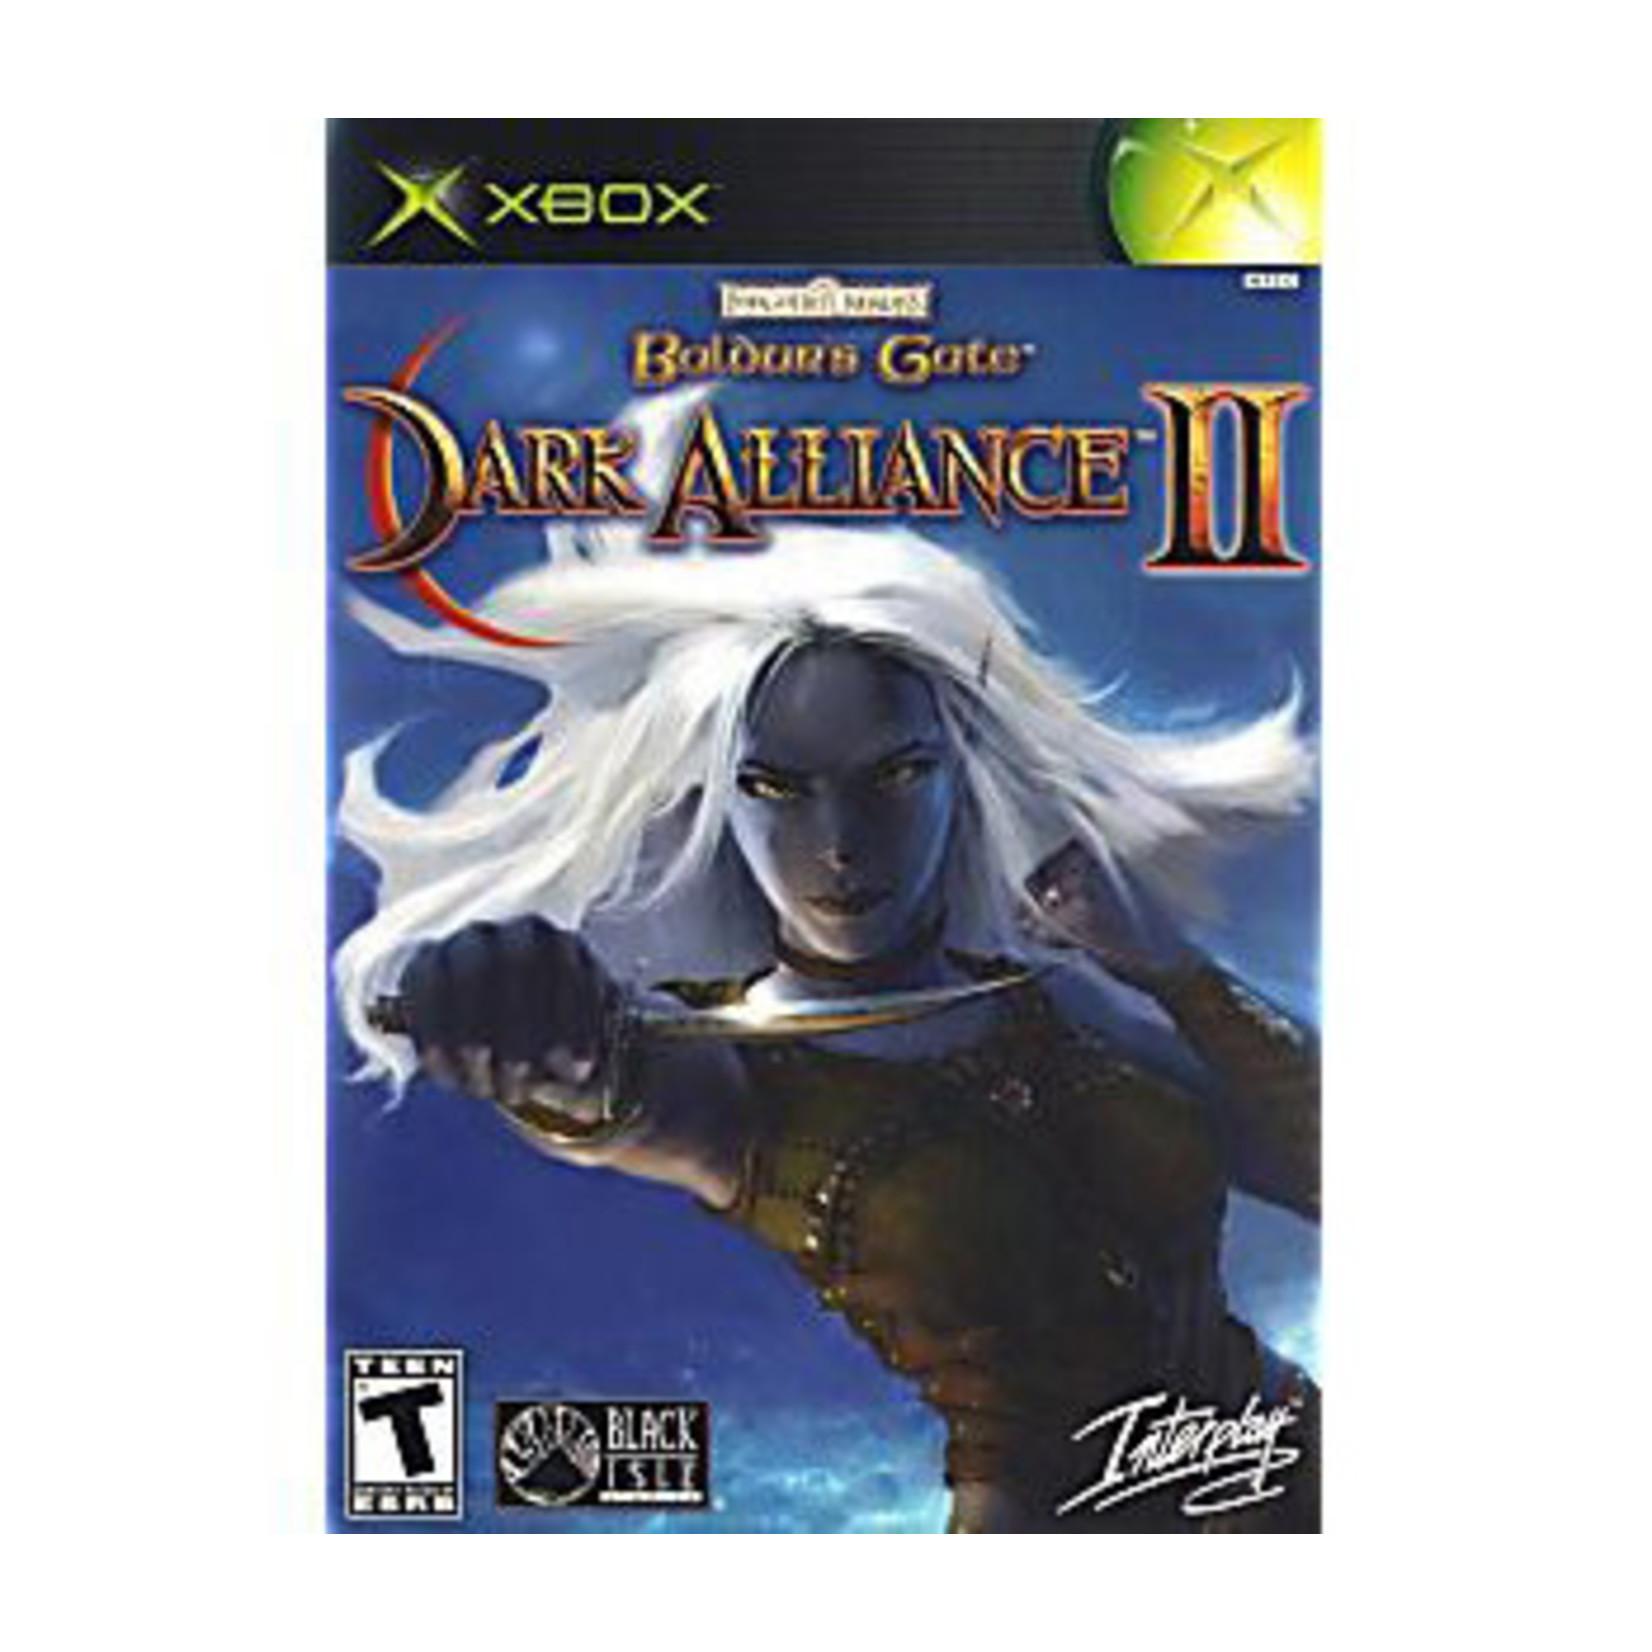 XBU-DARK ALLIANCE 2